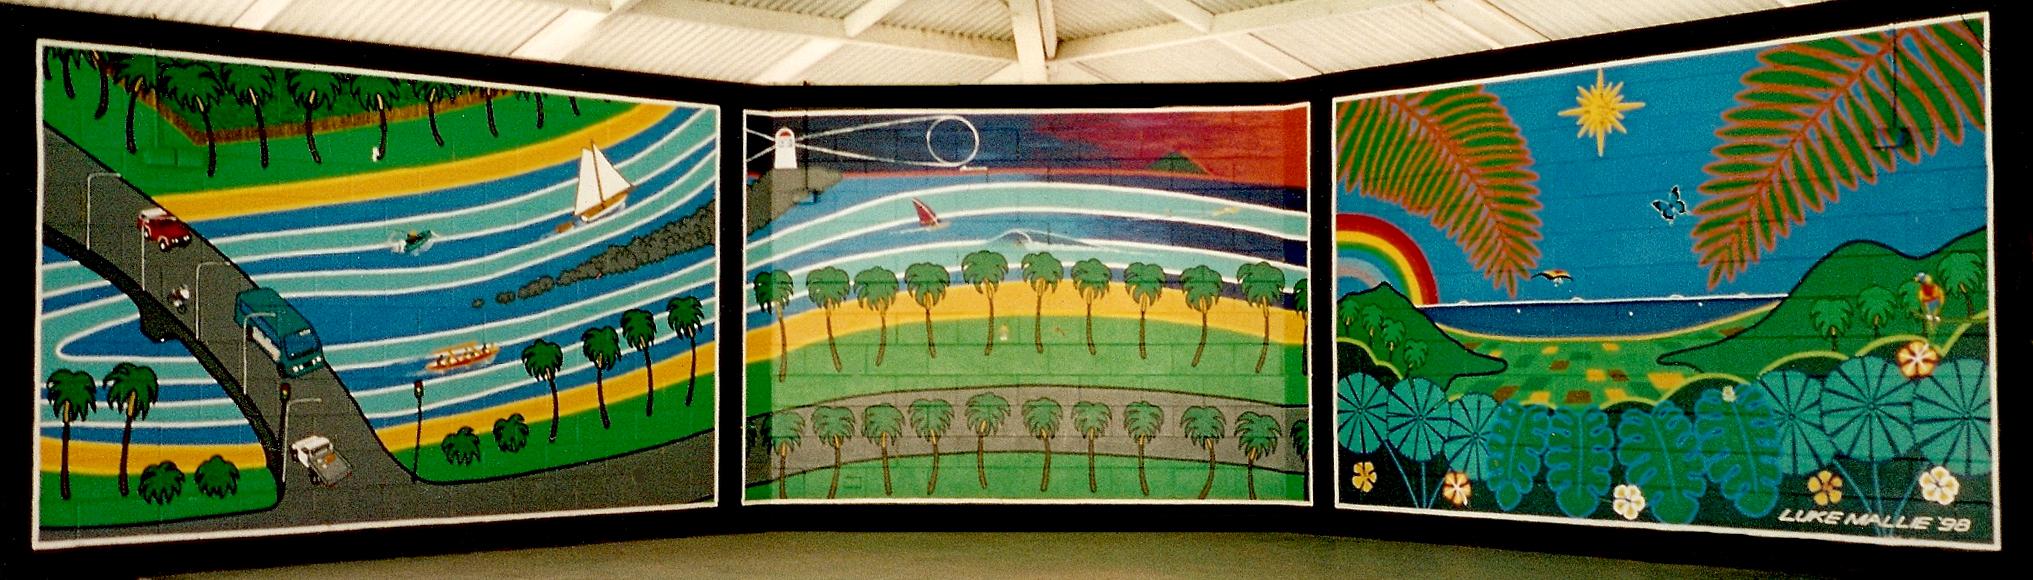 nrth mky primary mural.jpg